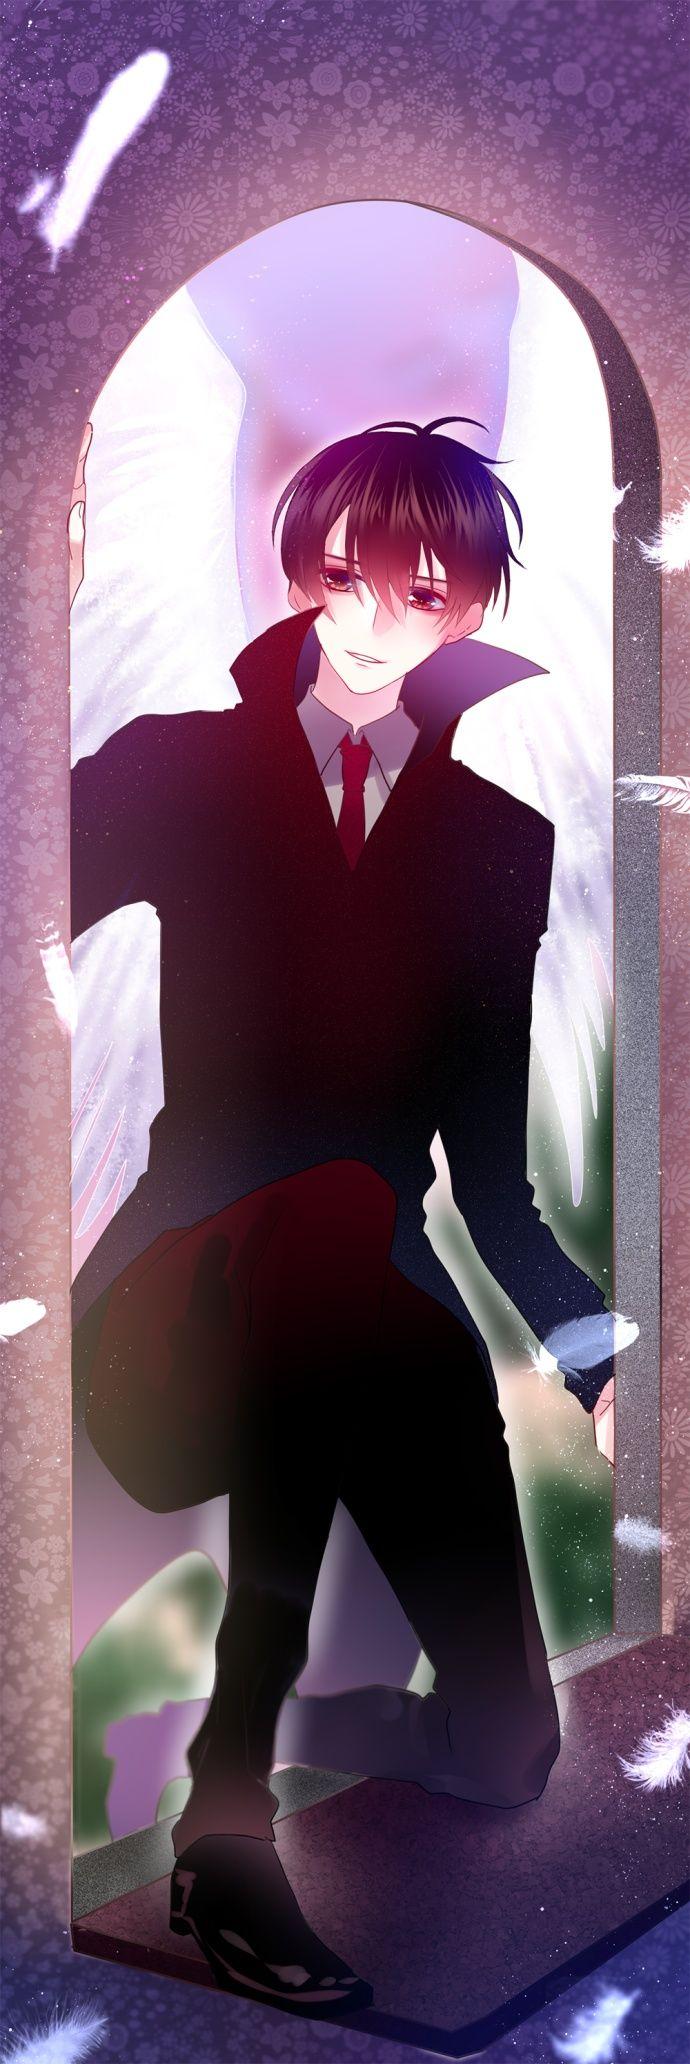 Ghim của Sparkling STARS trên Handsome Boy anime, manga